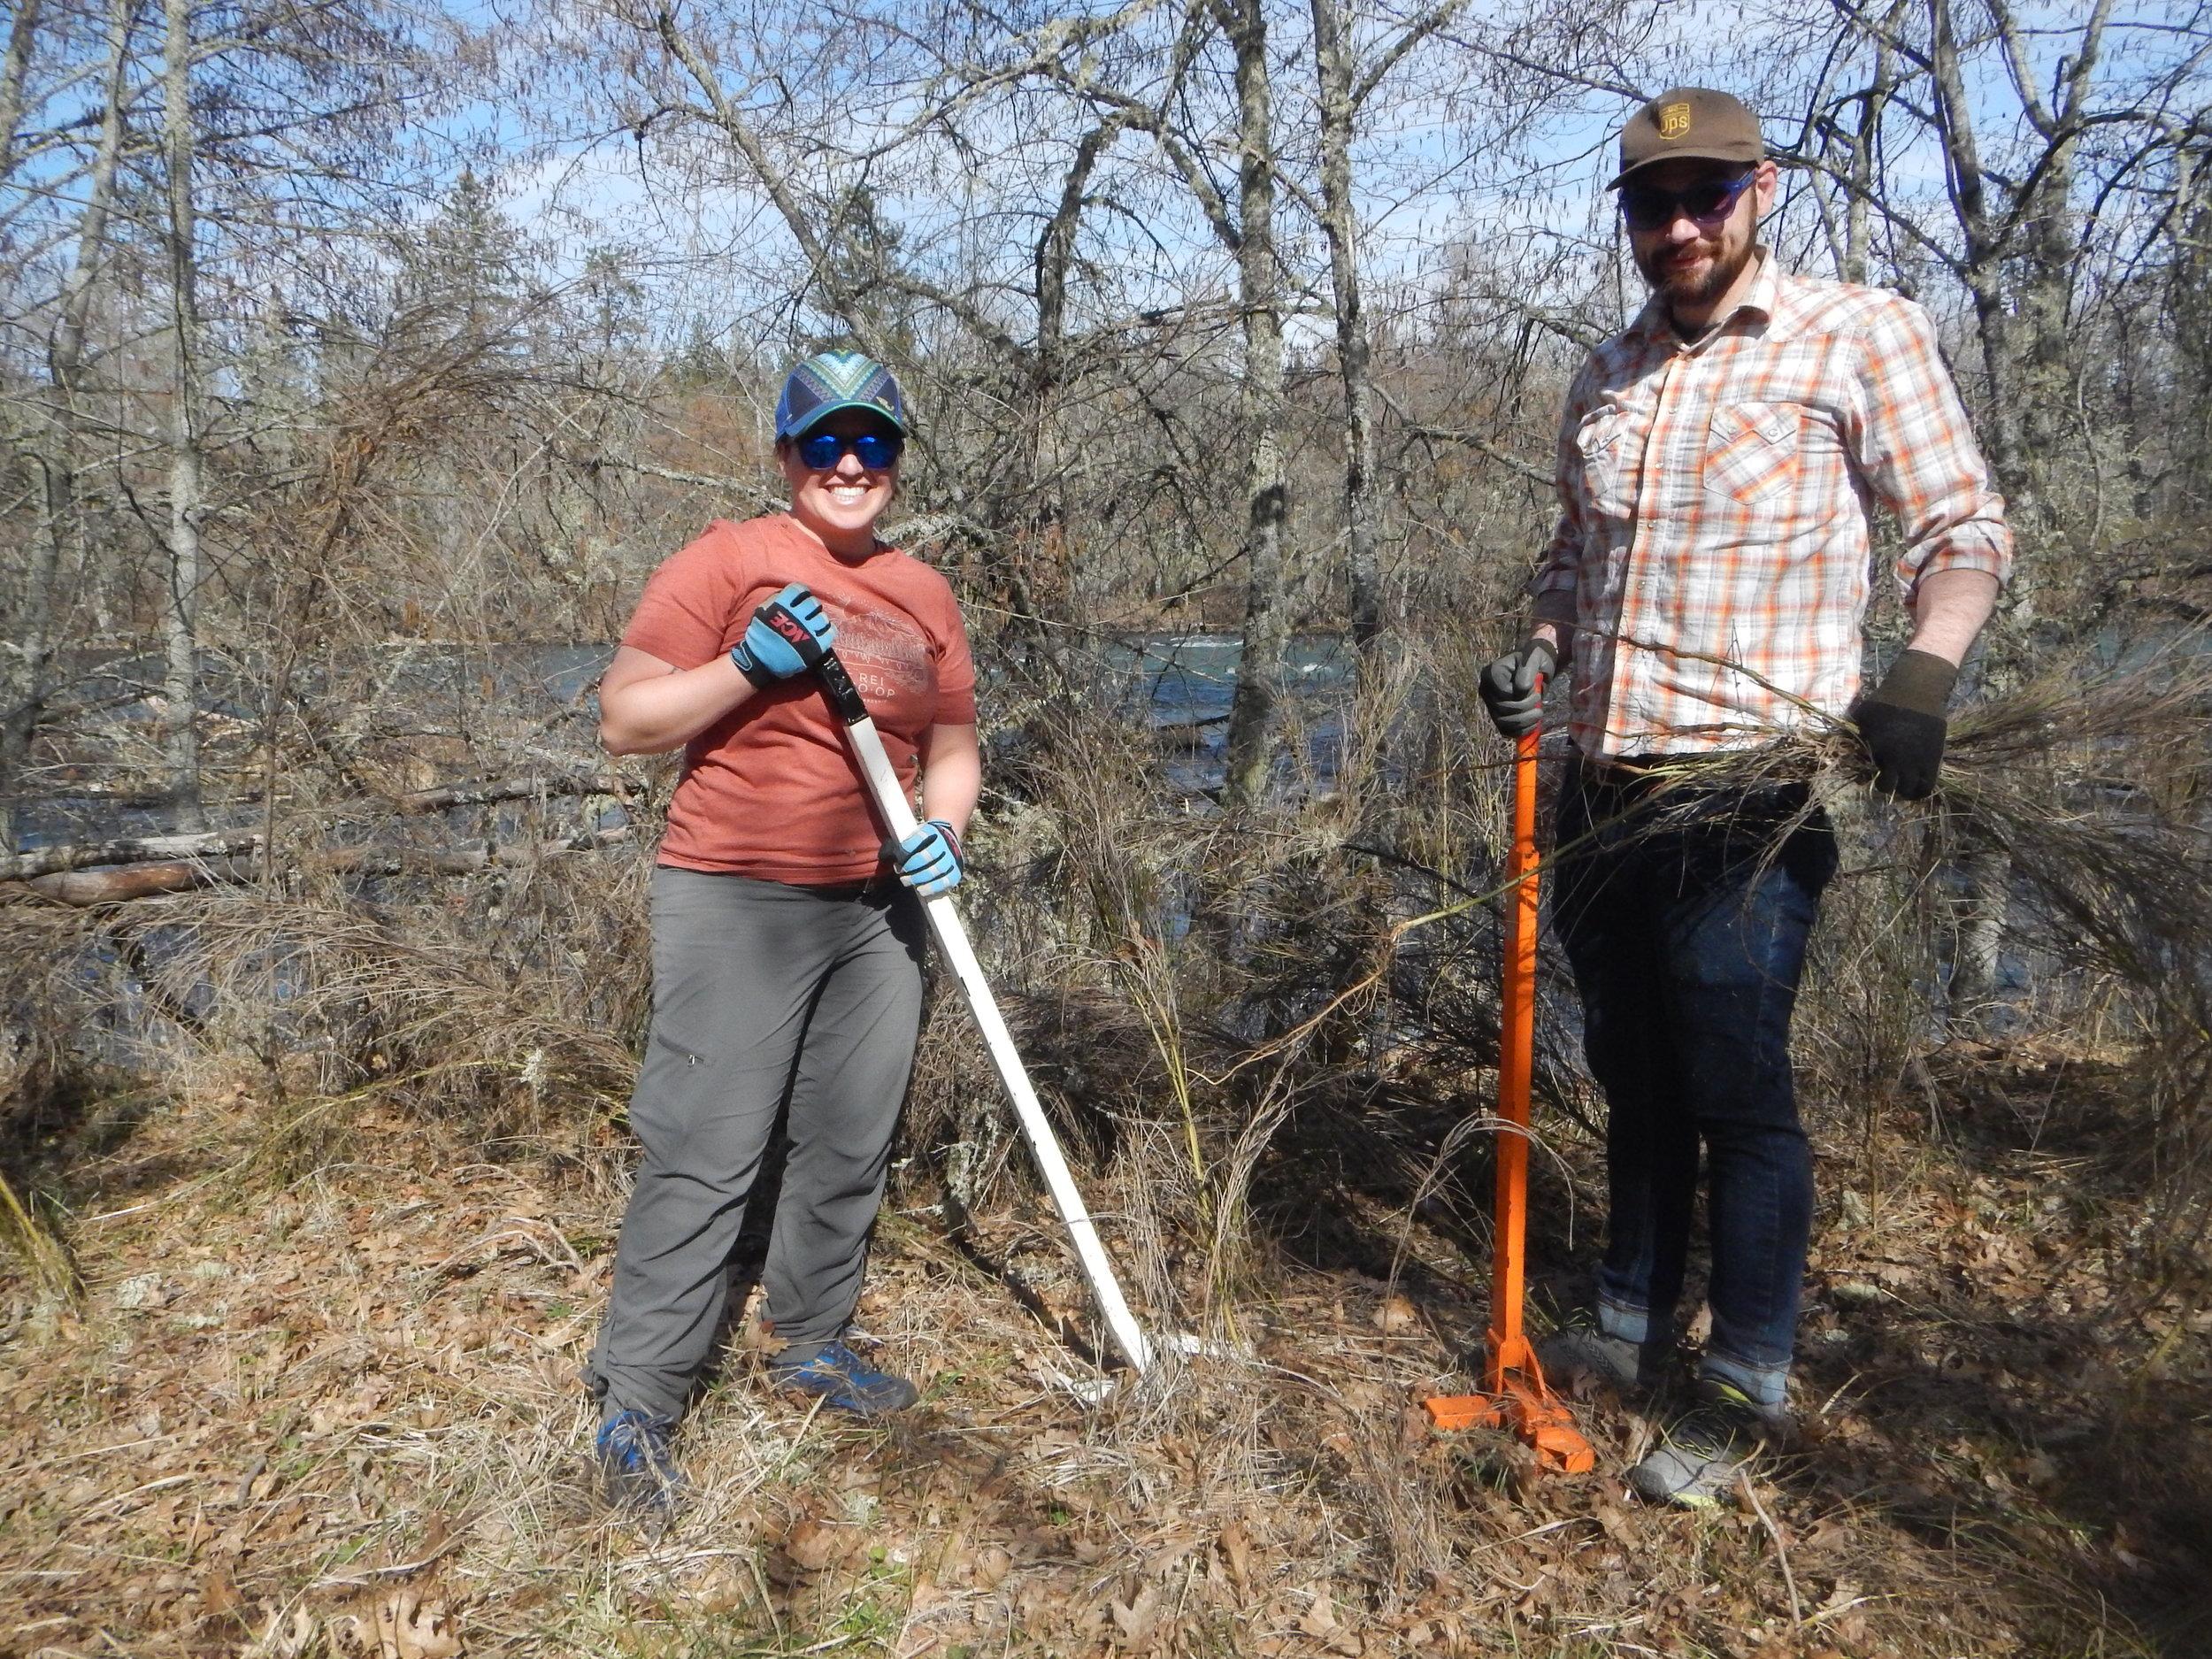 Volunteers doing the good work removing invasive Scotch broom.